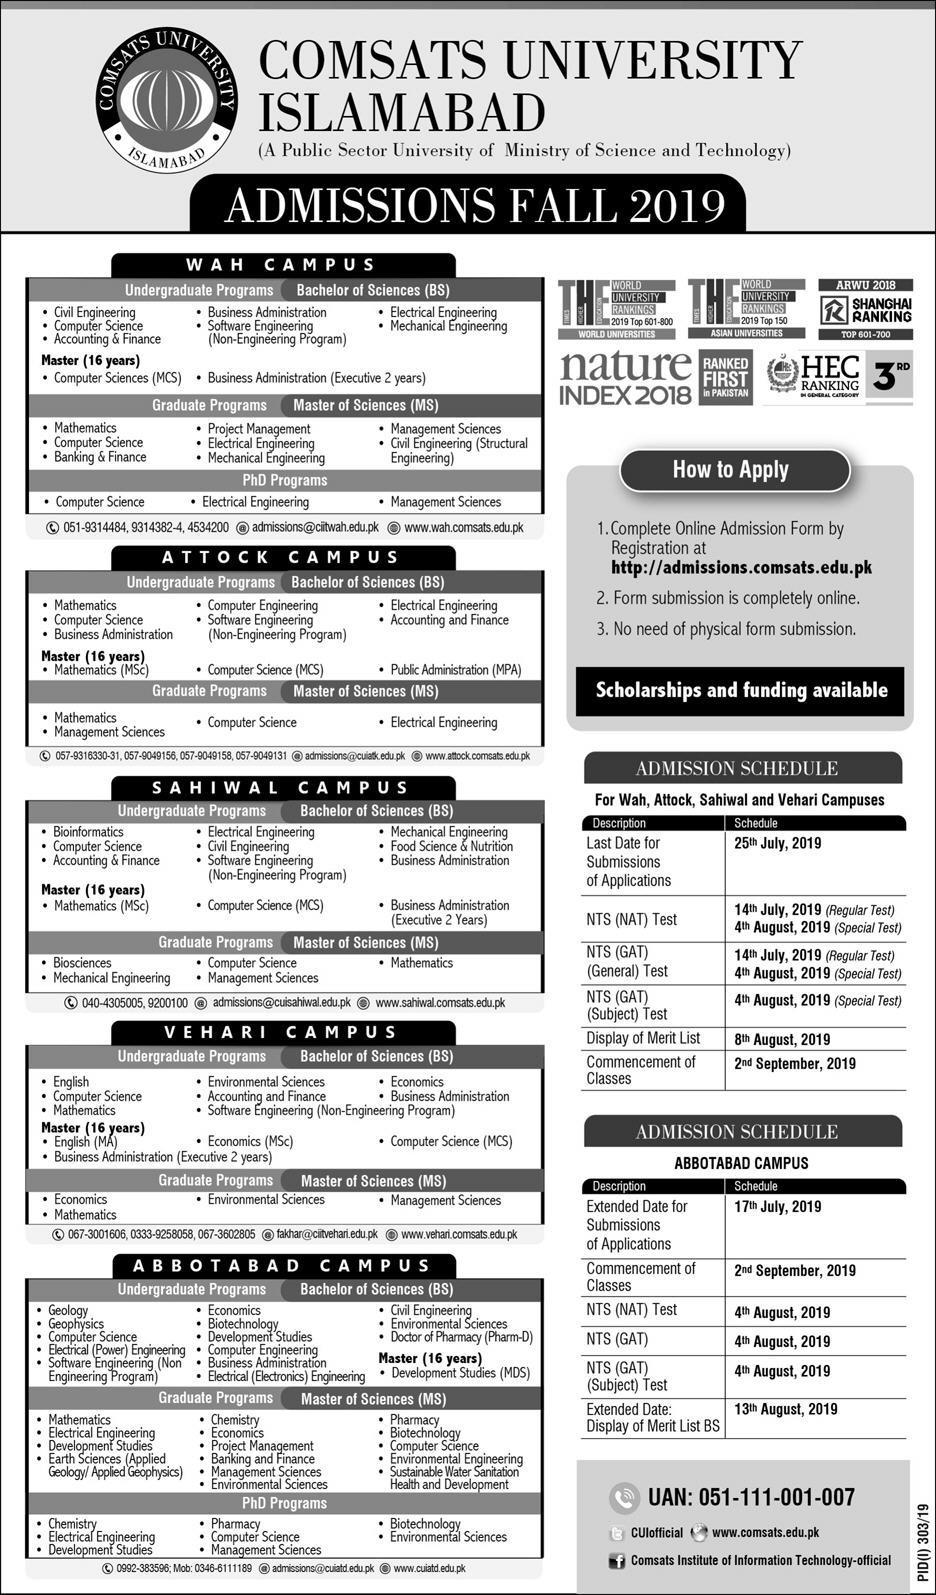 COMSATS Islamabad Fall Admissions 2019